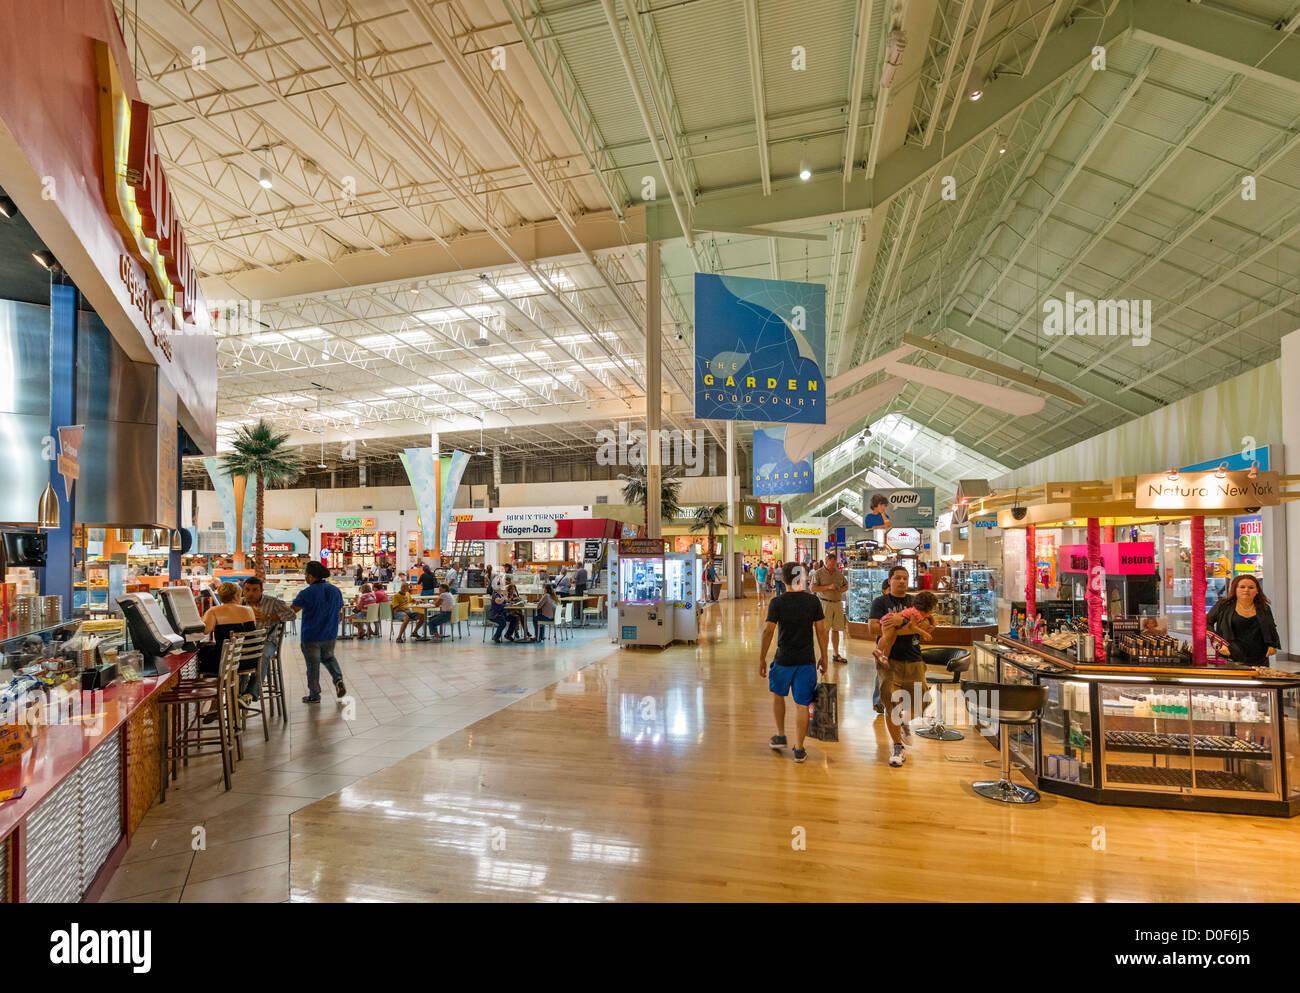 Food Court inside the Sawgrass Mills shopping mall, Sunrise, Broward County, Florida, USA - Stock Image